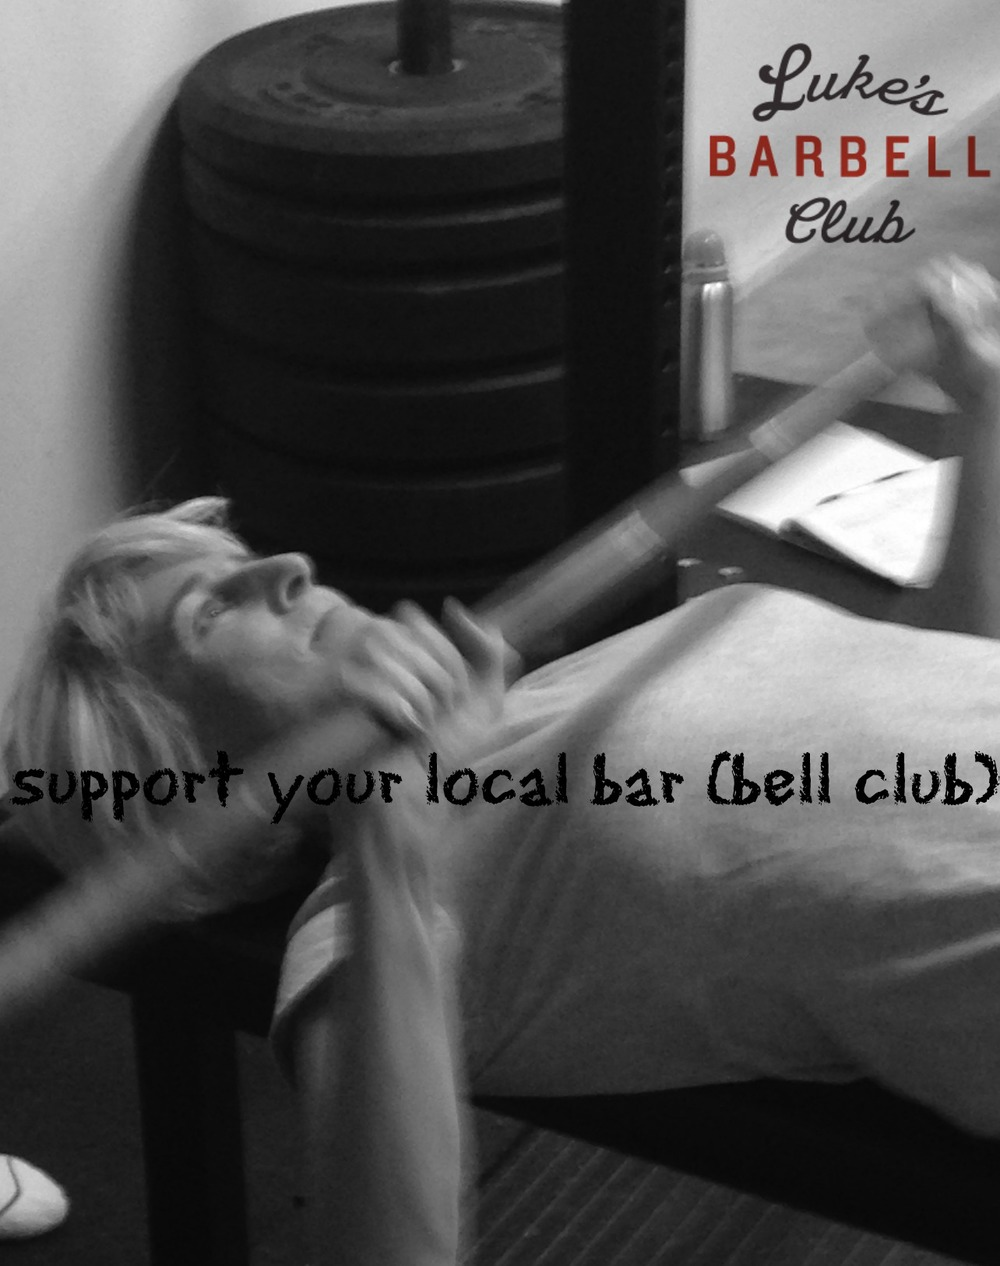 Rehab Lukes Barbell Club